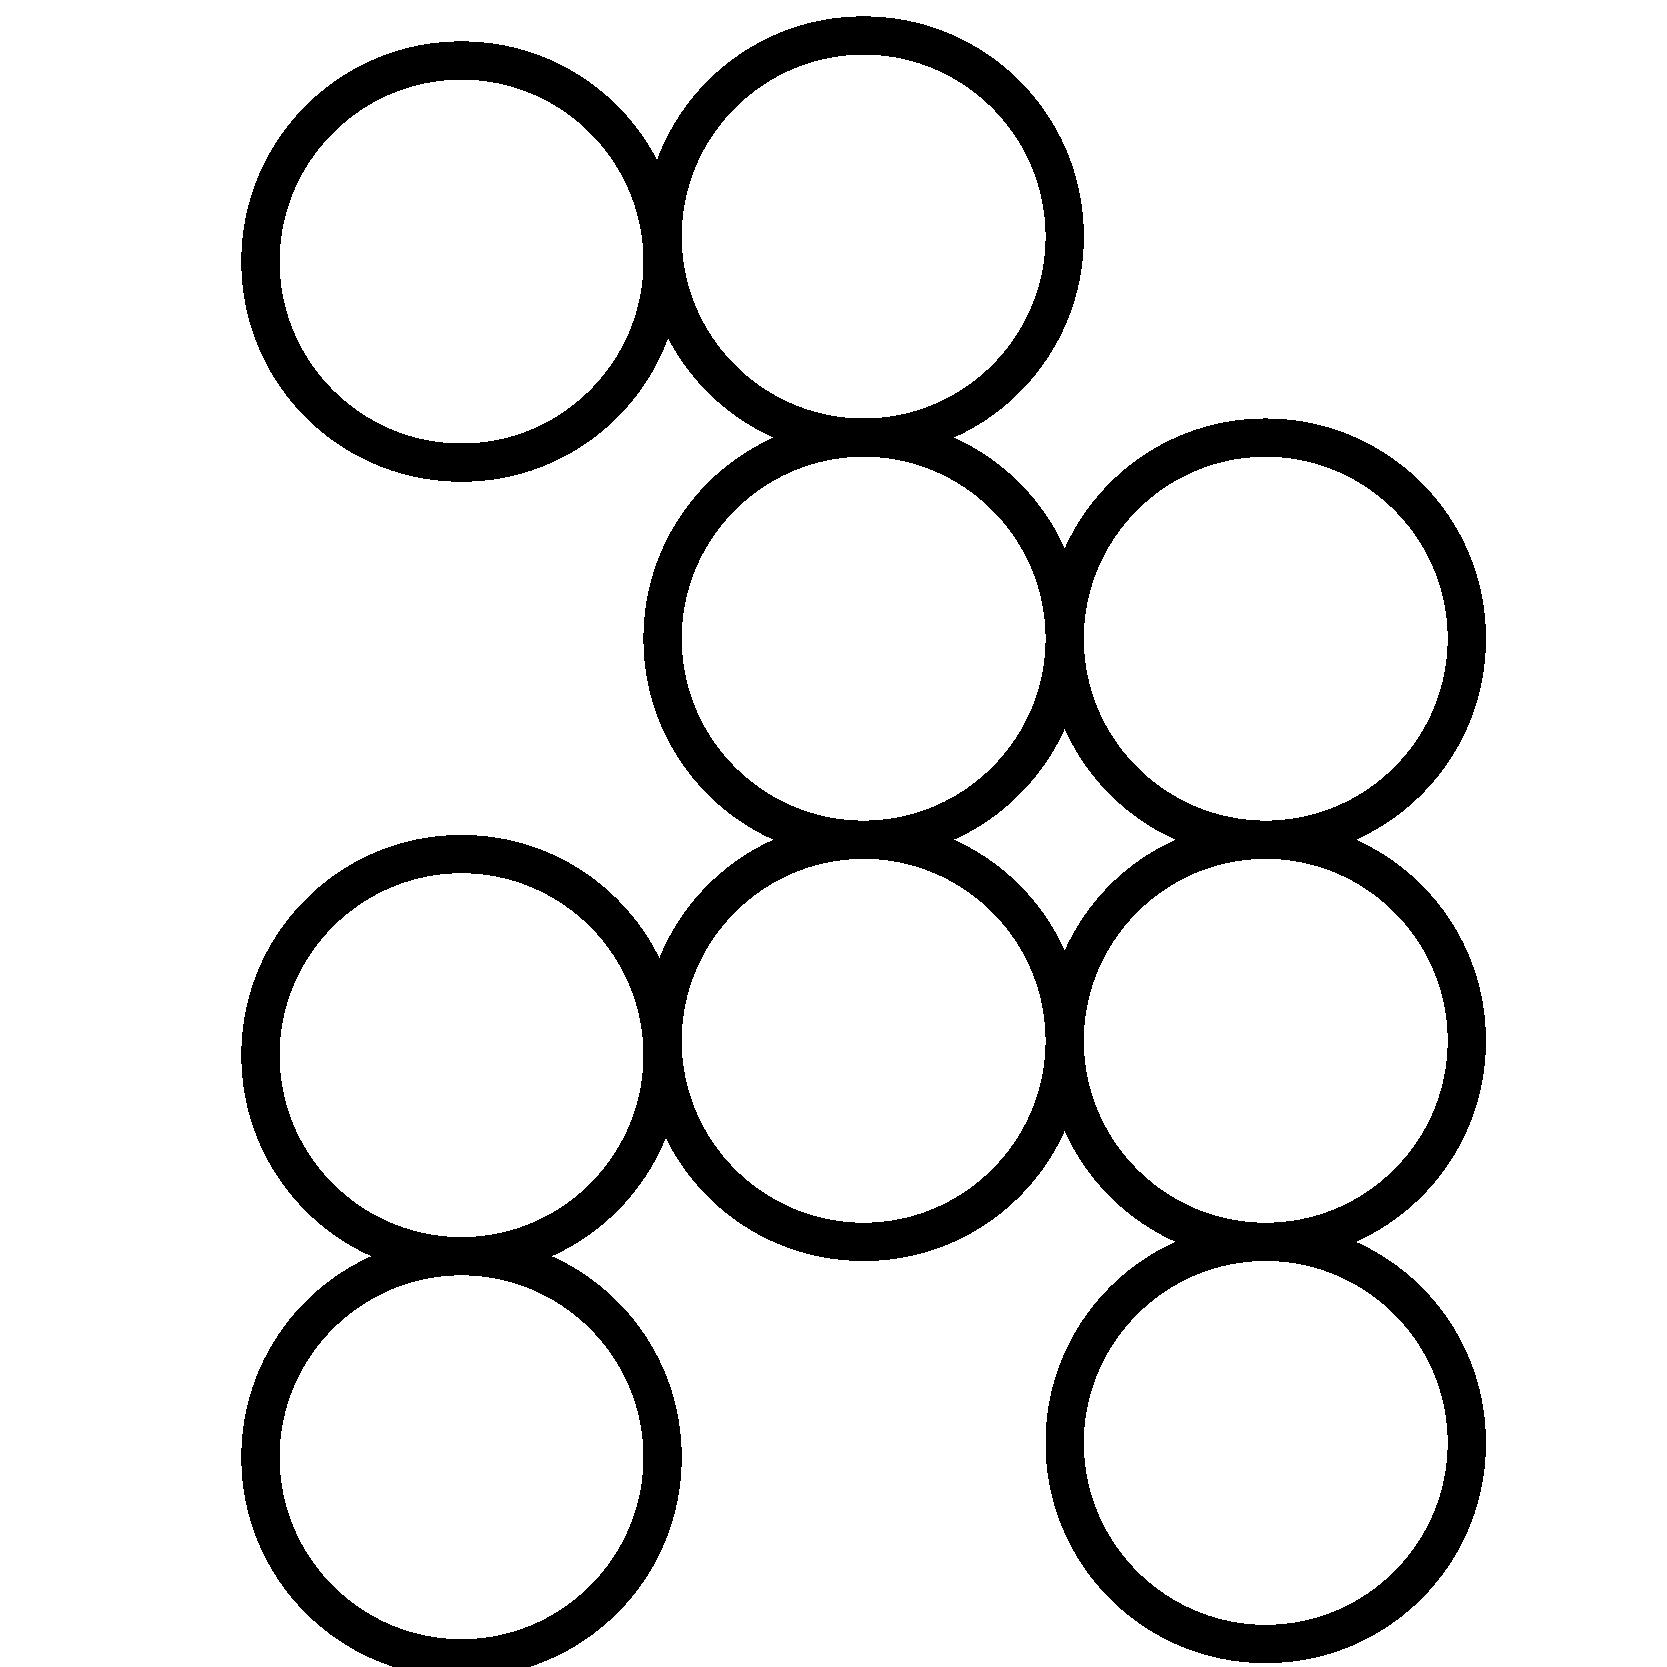 BID-principle-icons-04.png